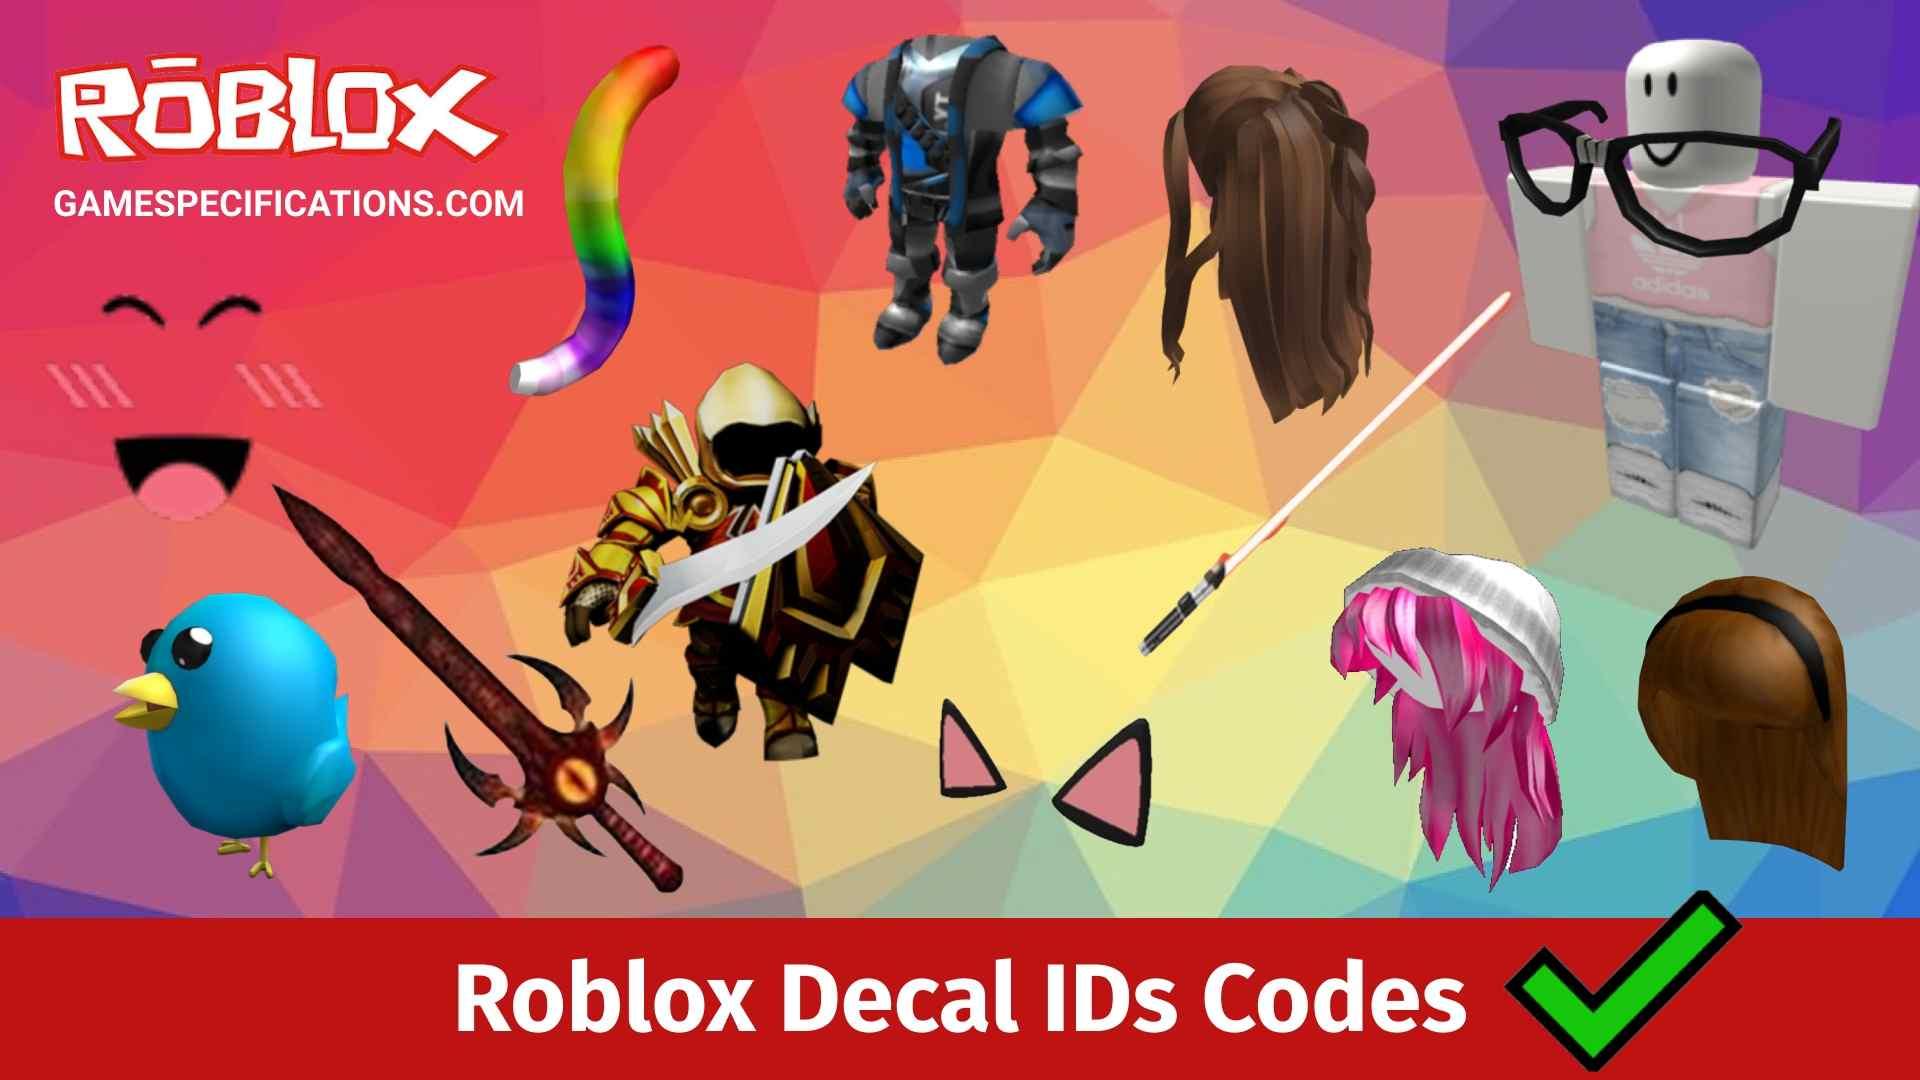 Roblox Decal ID